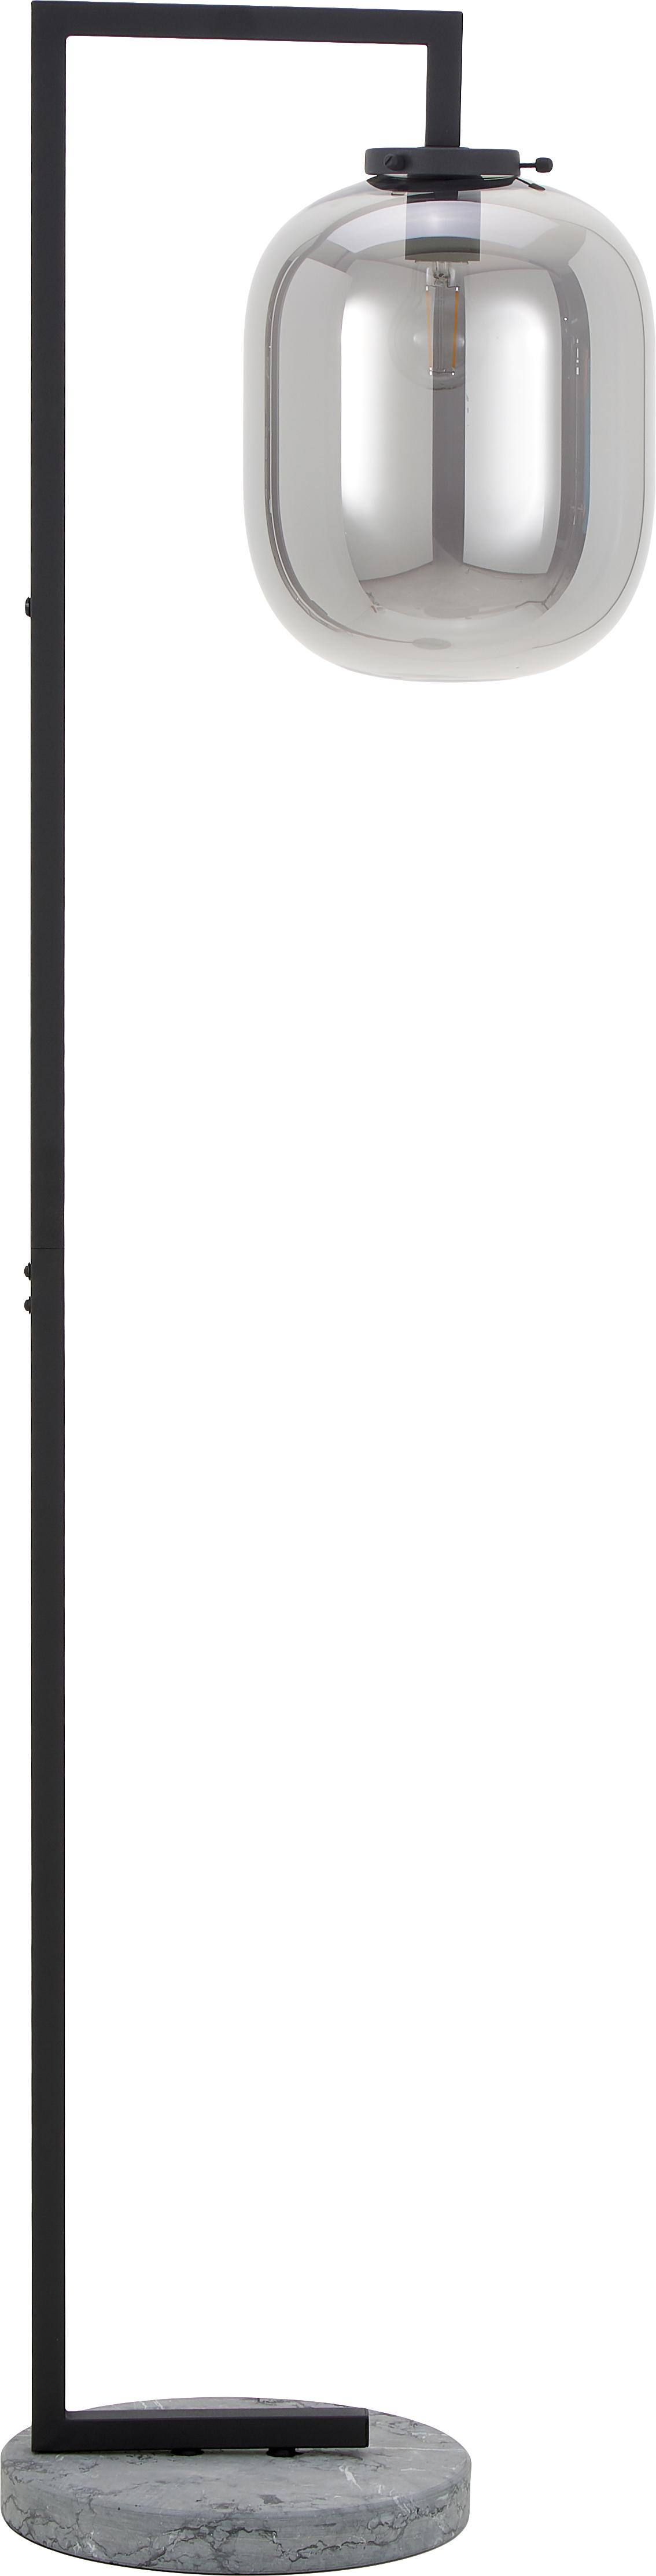 Vloerlamp Leola met marmeren voet, Lampenkap: verchroomd glas, Frame: gelakt metaal, Lampvoet: marmer, Chroomkleurig, zwart, Ø 38 x H 150 cm